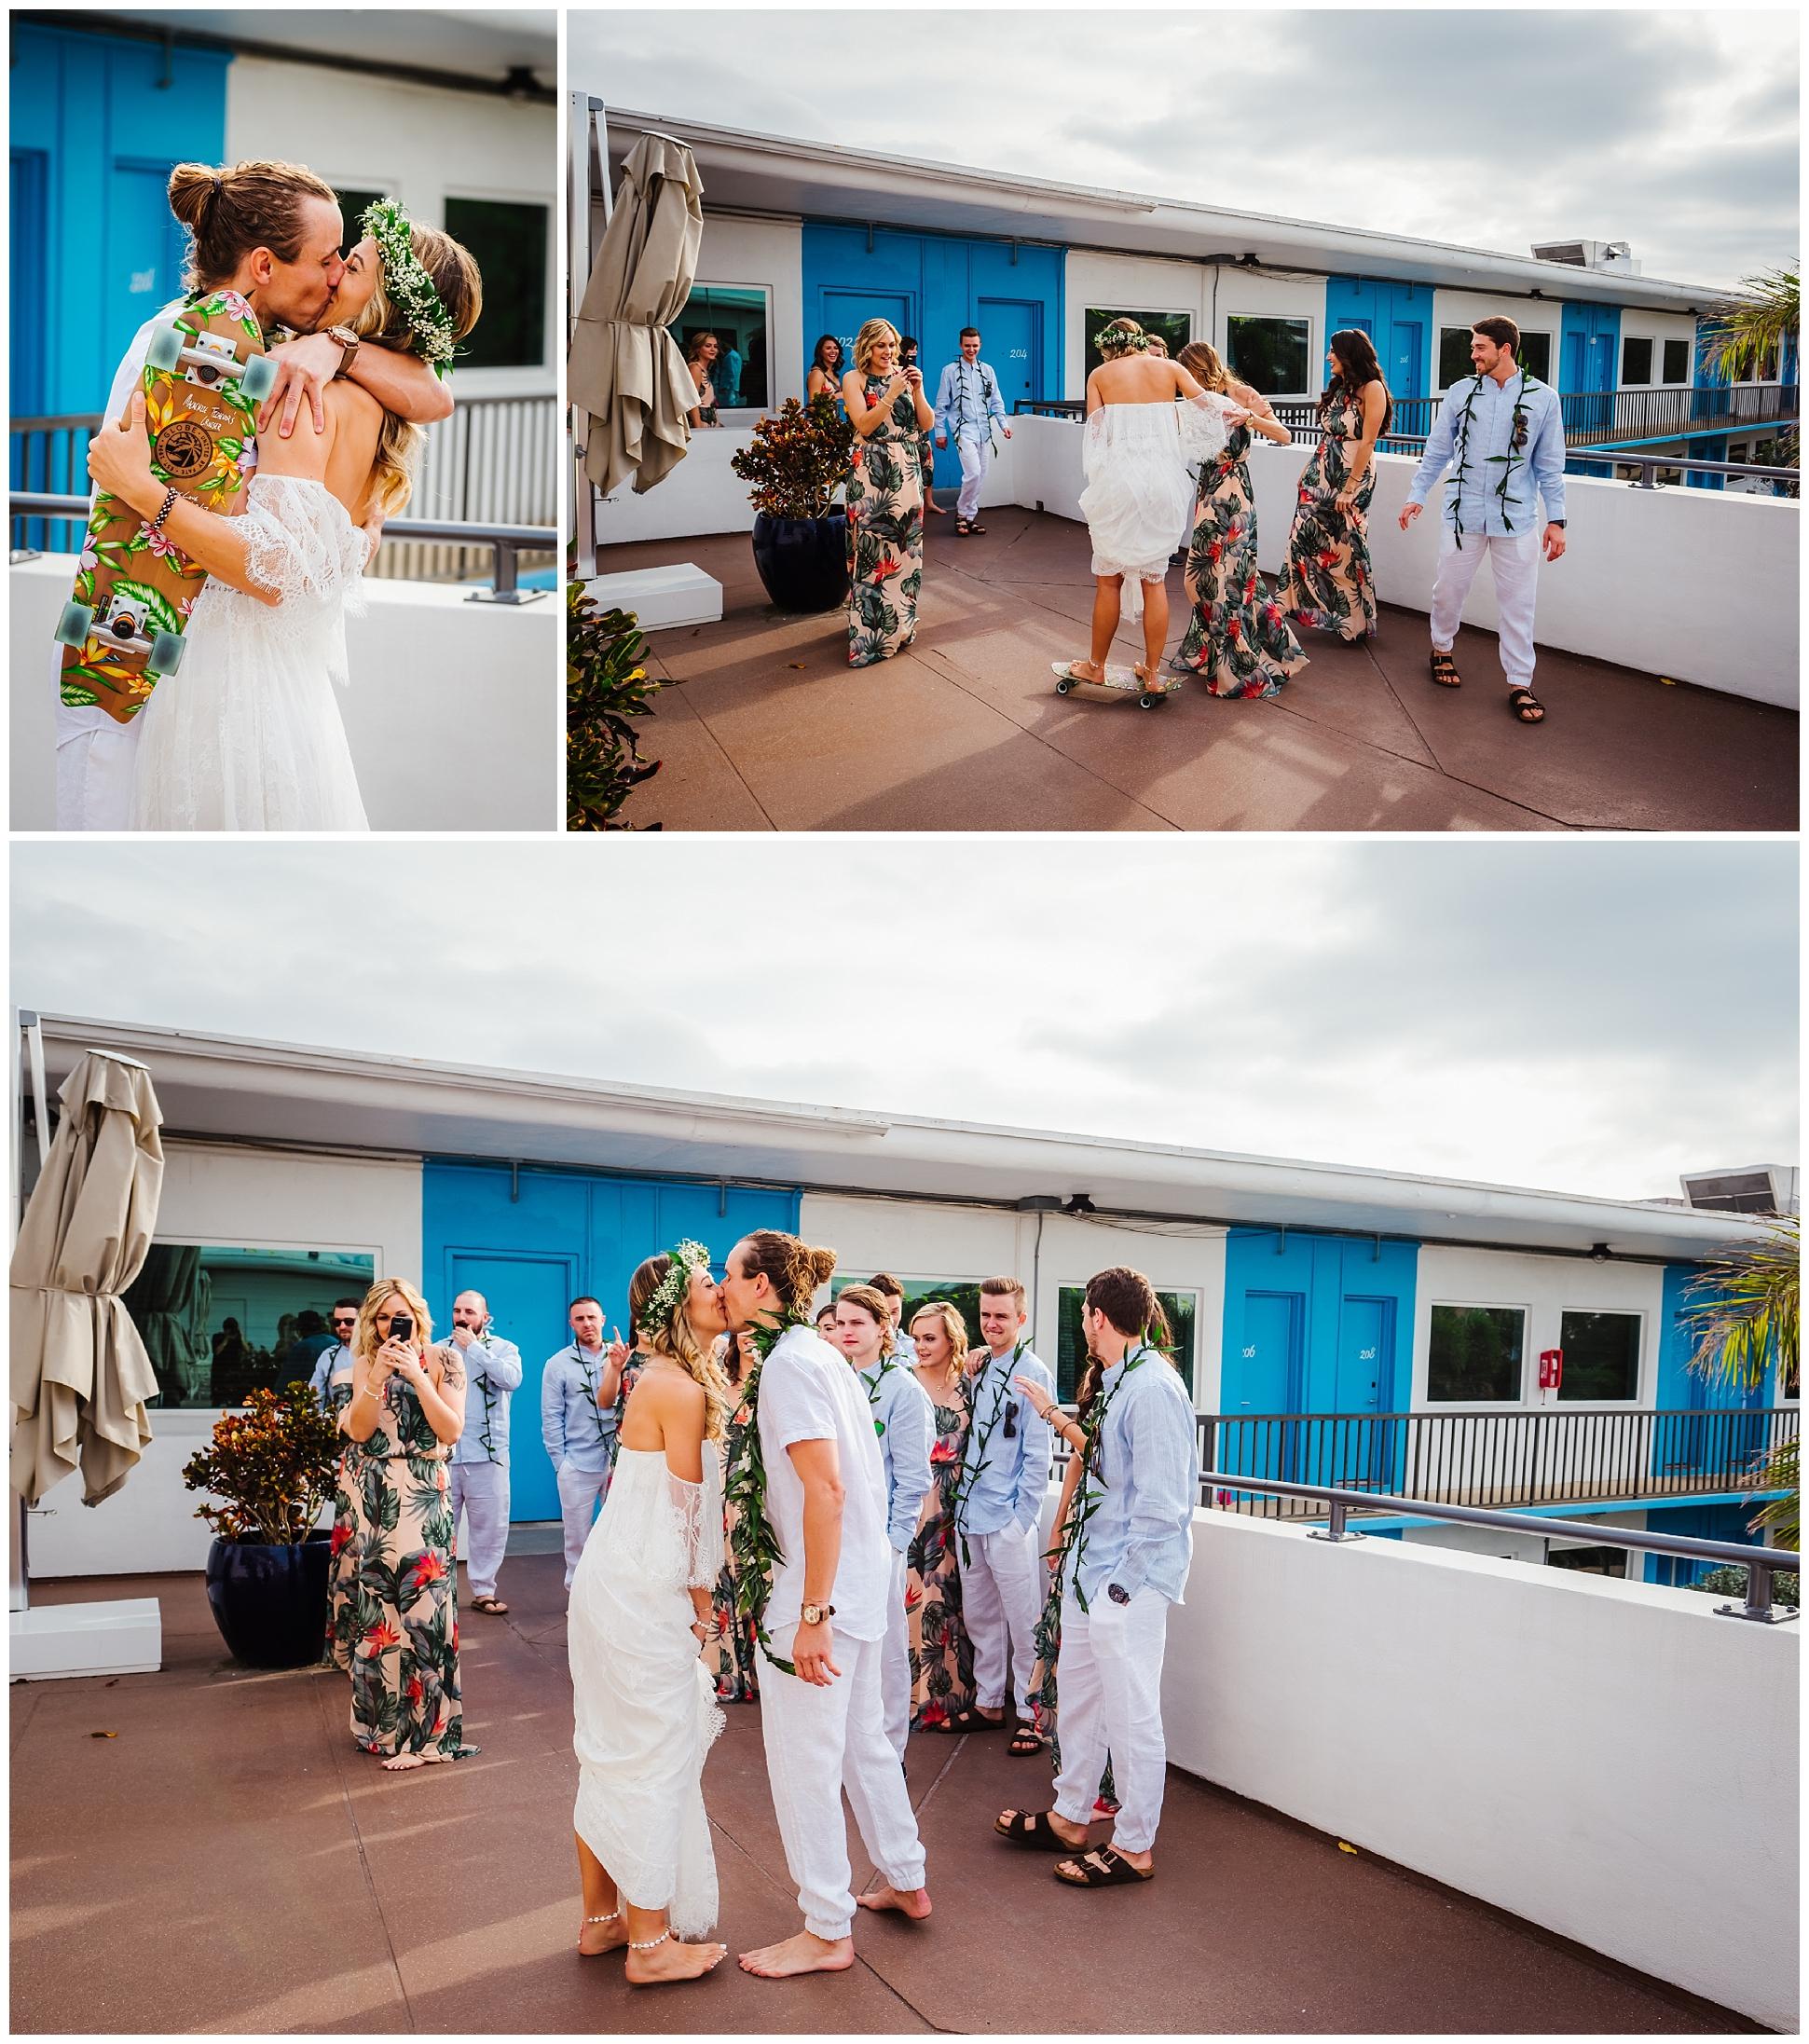 tampa-bay-wedding-photographer-barefoot-post-card-inn-tropical-hawaiin-lei-pink-pineapples-flower-crown_0139.jpg